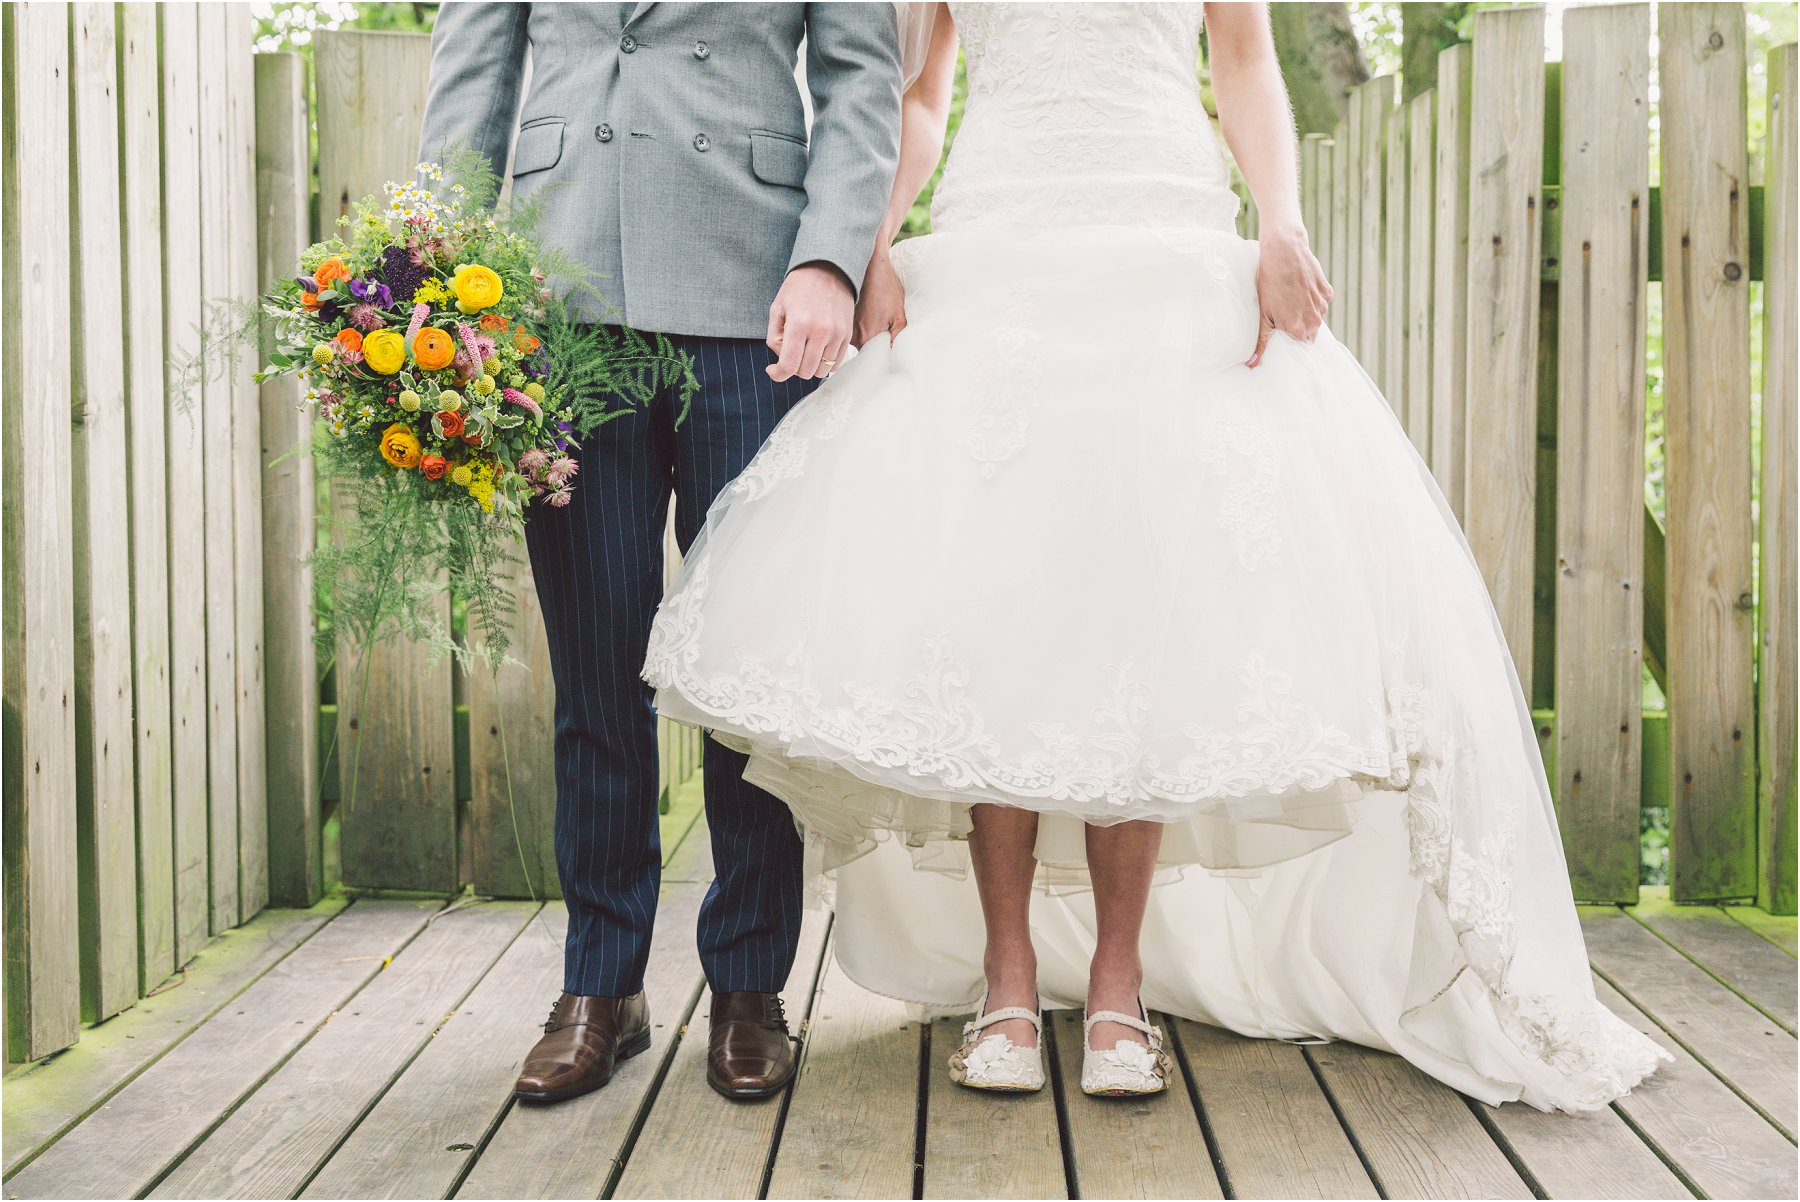 eve.photography.relaxed.creative.wedding.destination._0286.jpg